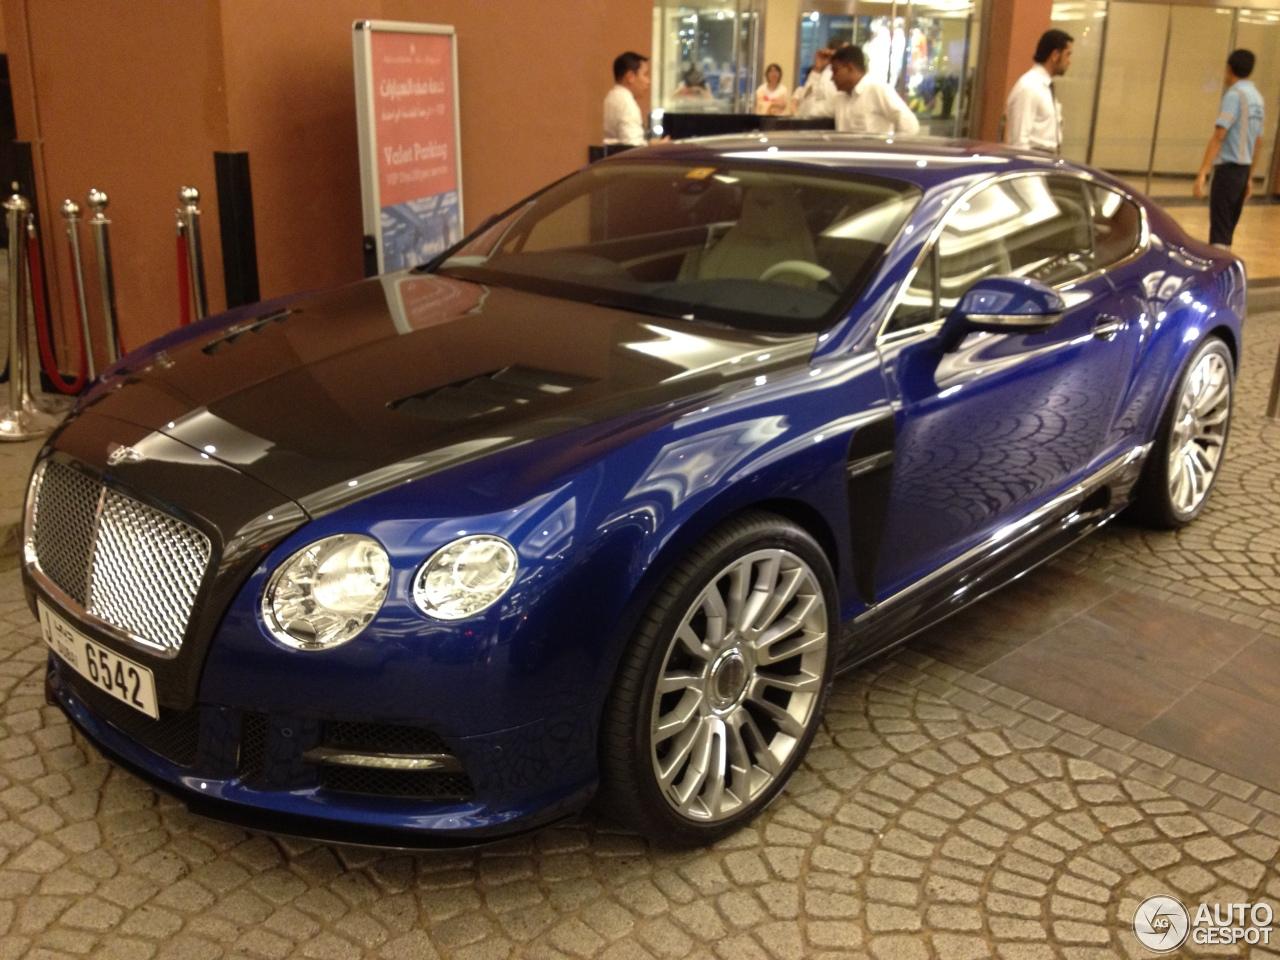 Bentley mansory continental gt 2012 21 november 2012 autogespot 1 i bentley mansory continental gt 2012 1 vanachro Gallery